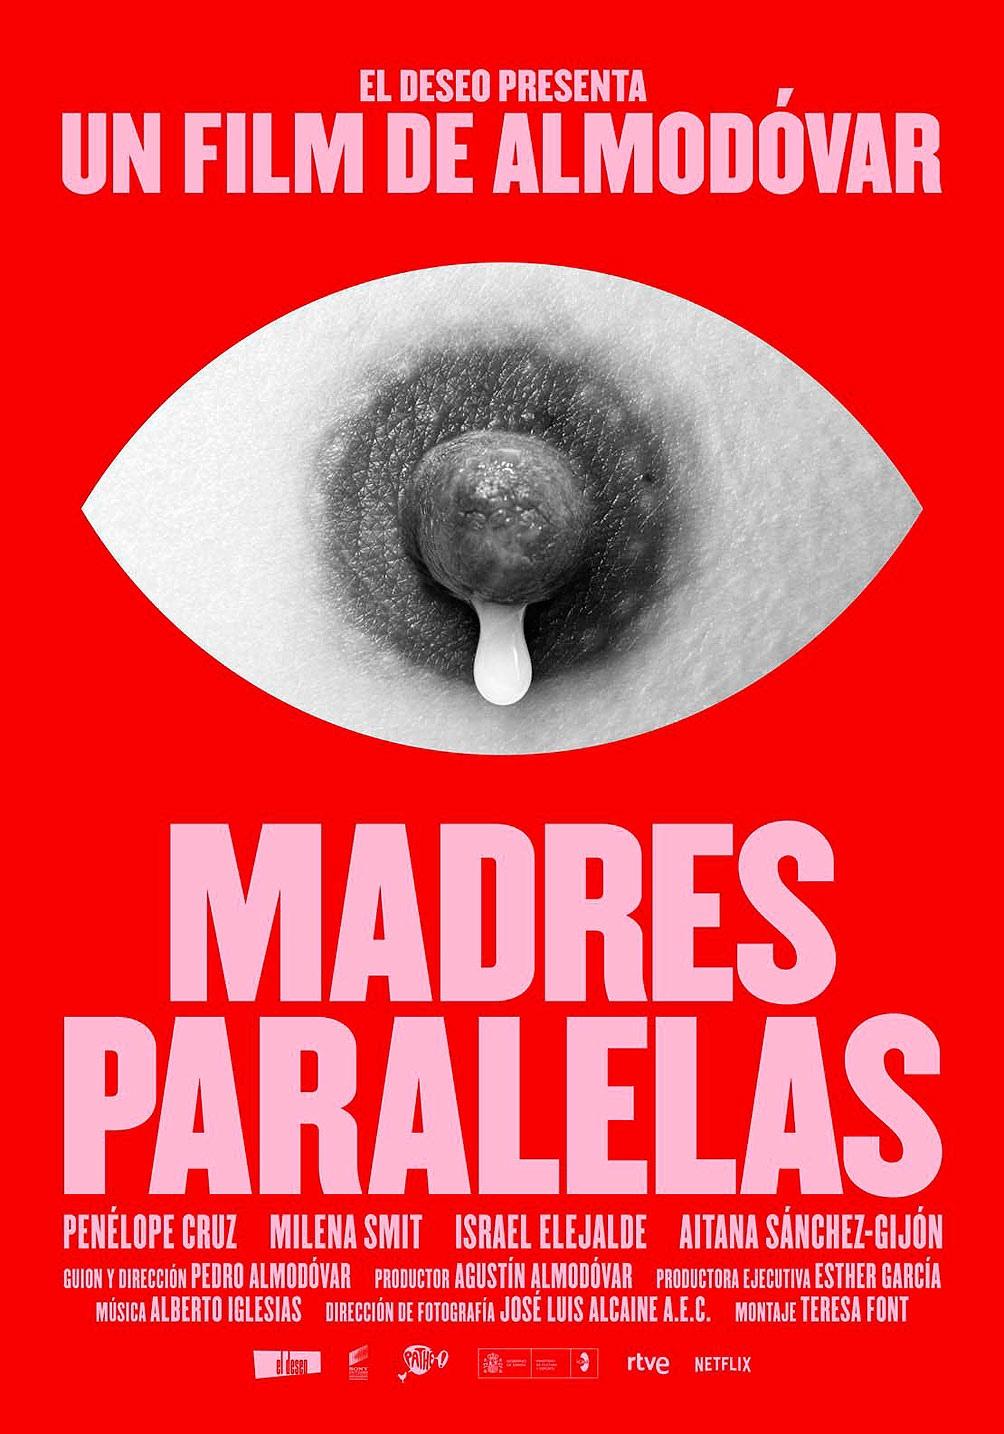 "Película de Almodóvar #madresparalelas"""